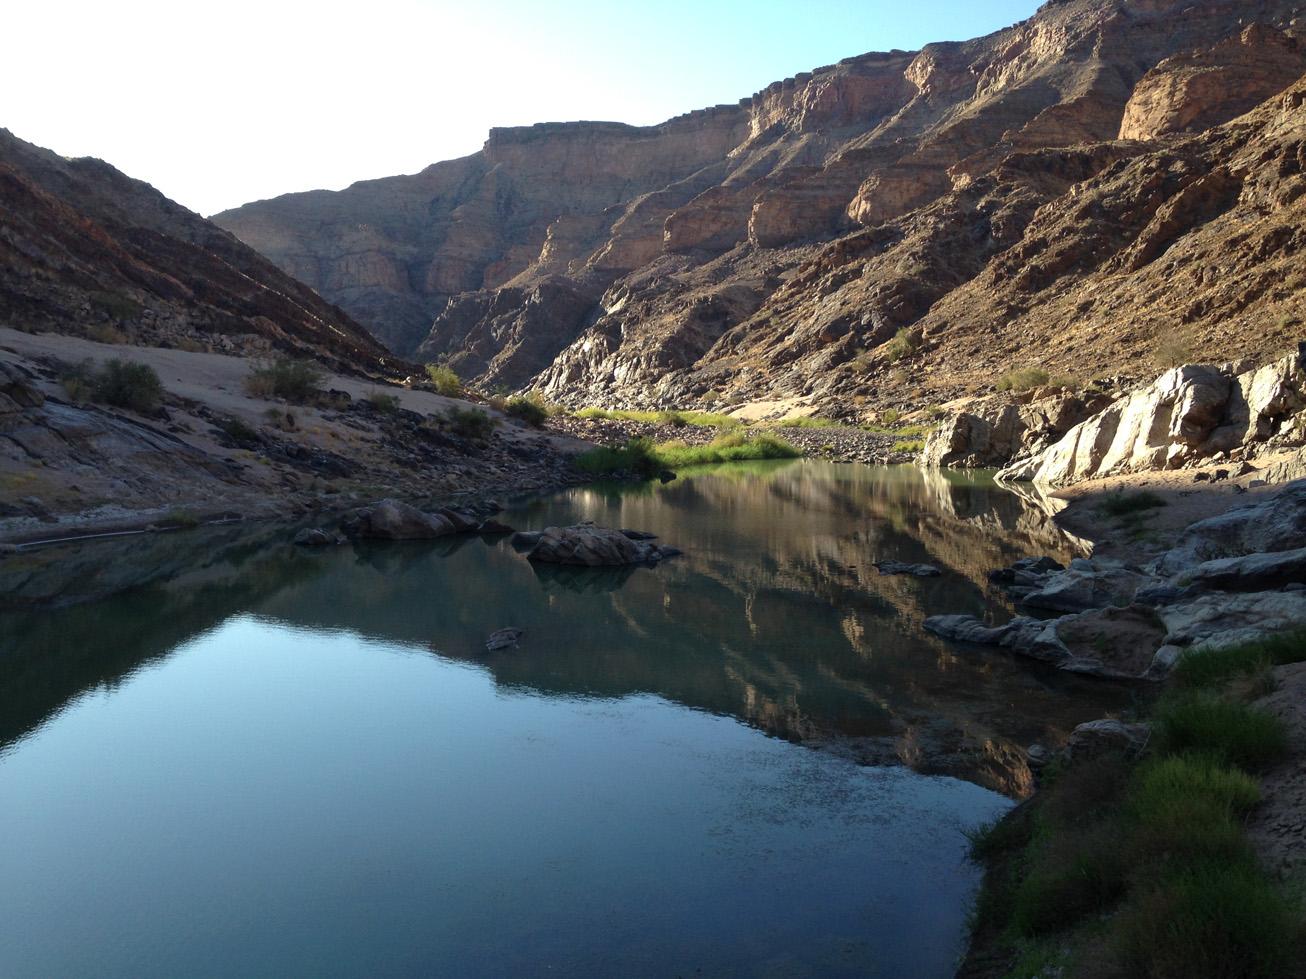 Fish River Canyon Hike 9